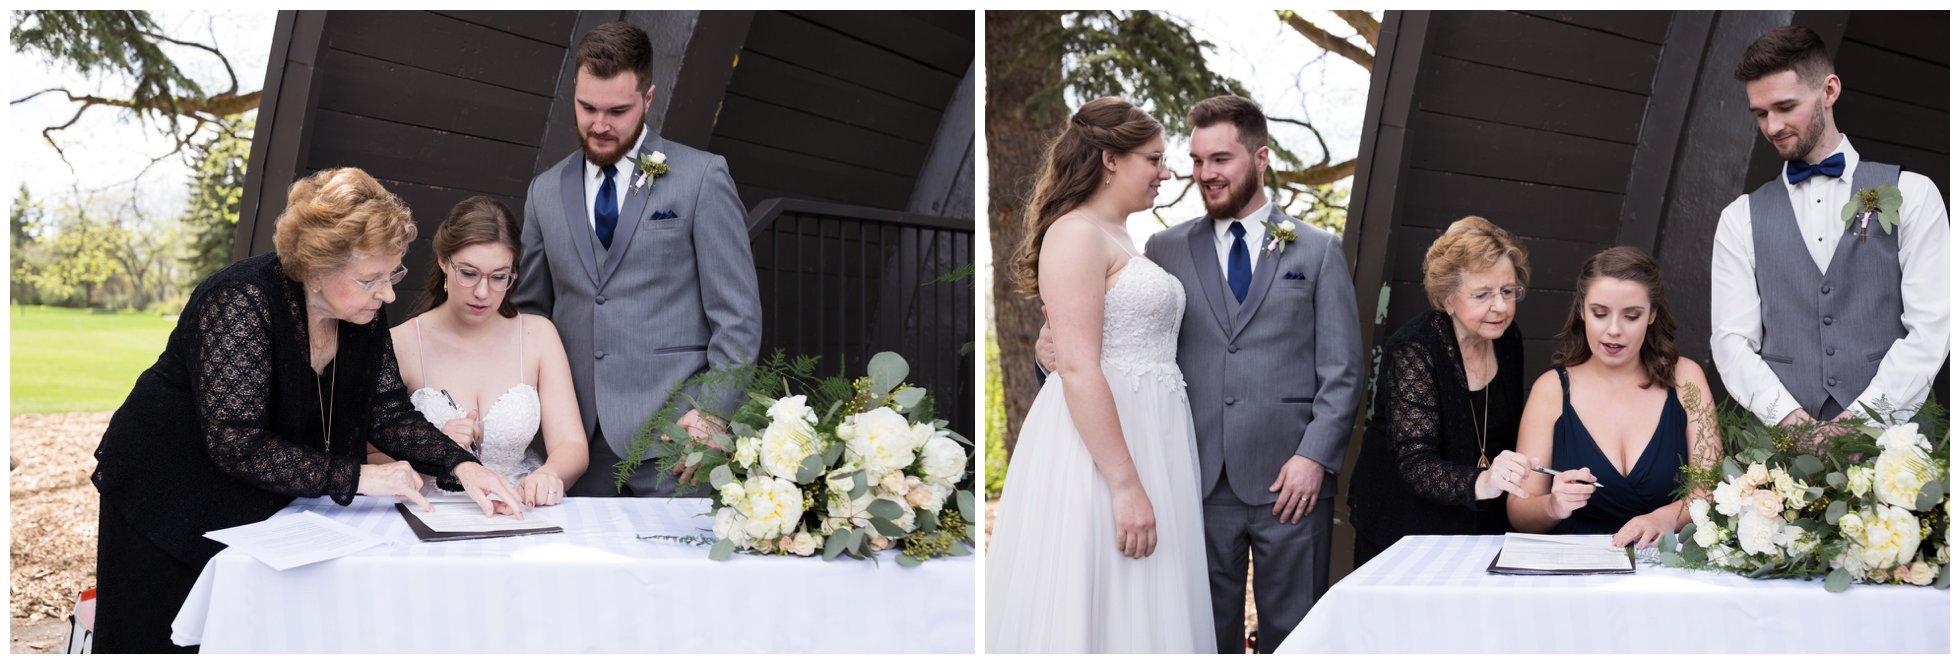 Emily and Royden Edmonton Wedding (Life by Selena Photography)_0014.jpg